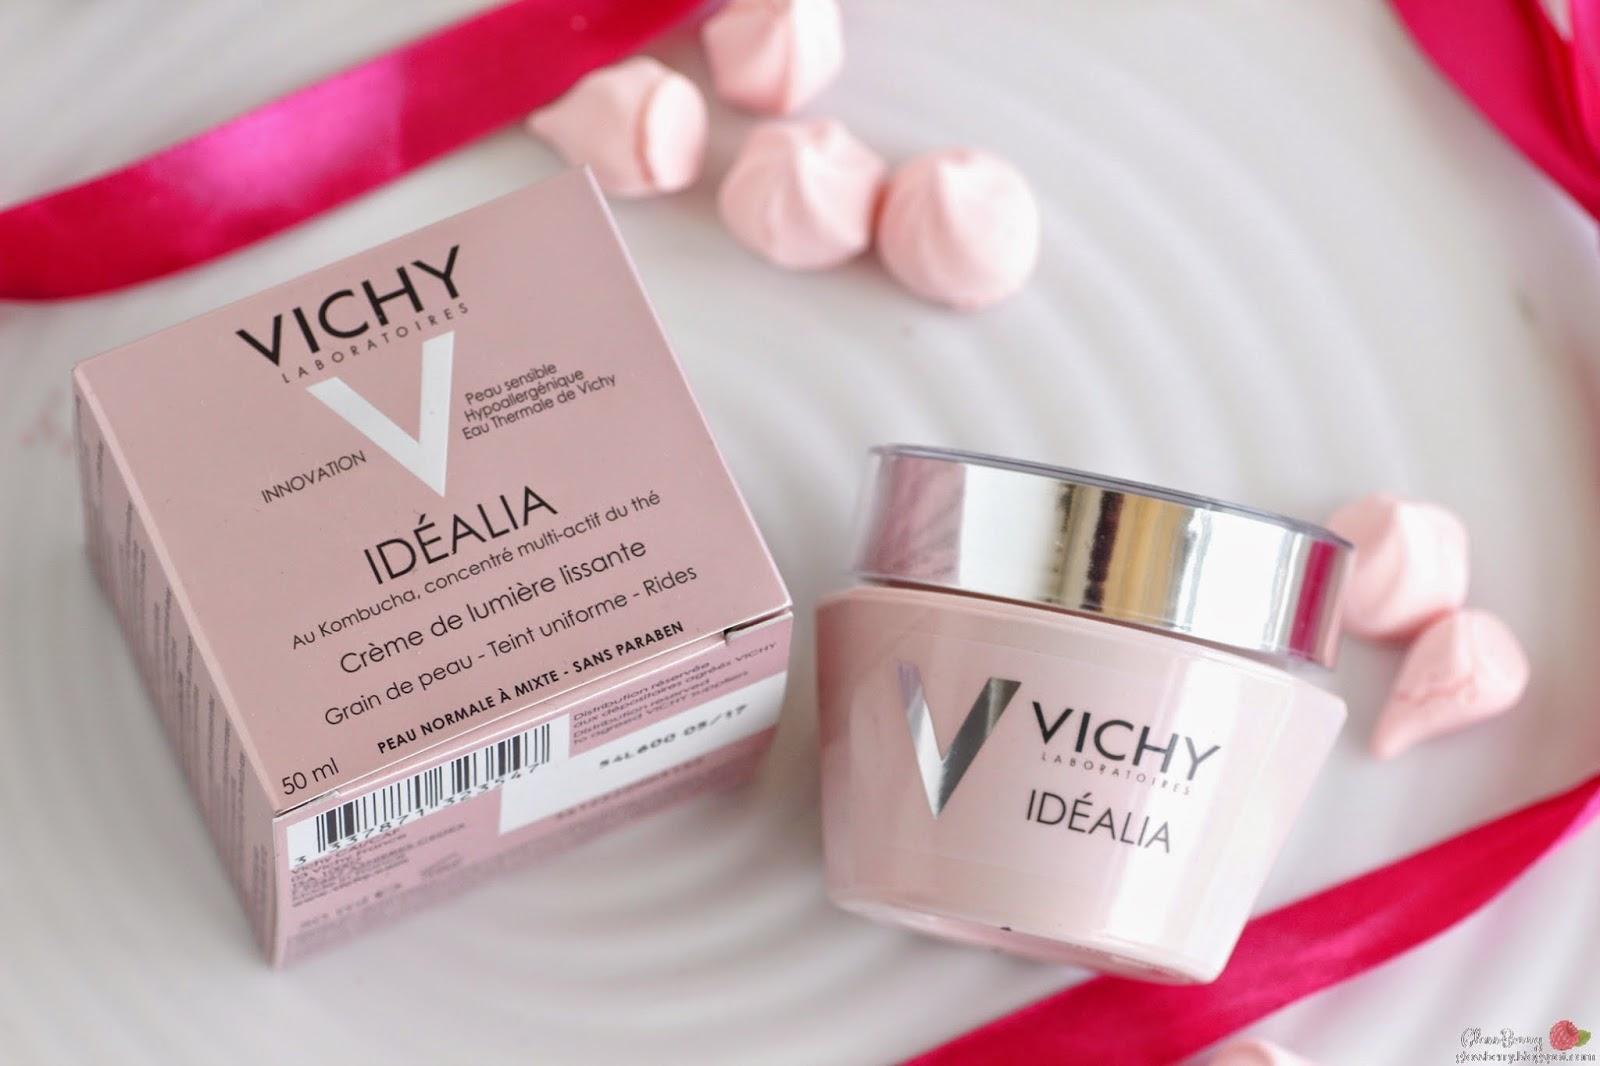 vichy idealia cream day anti wri anti aging nkle review סקירה קרם וישי אידיאליה אידיליה ורוד